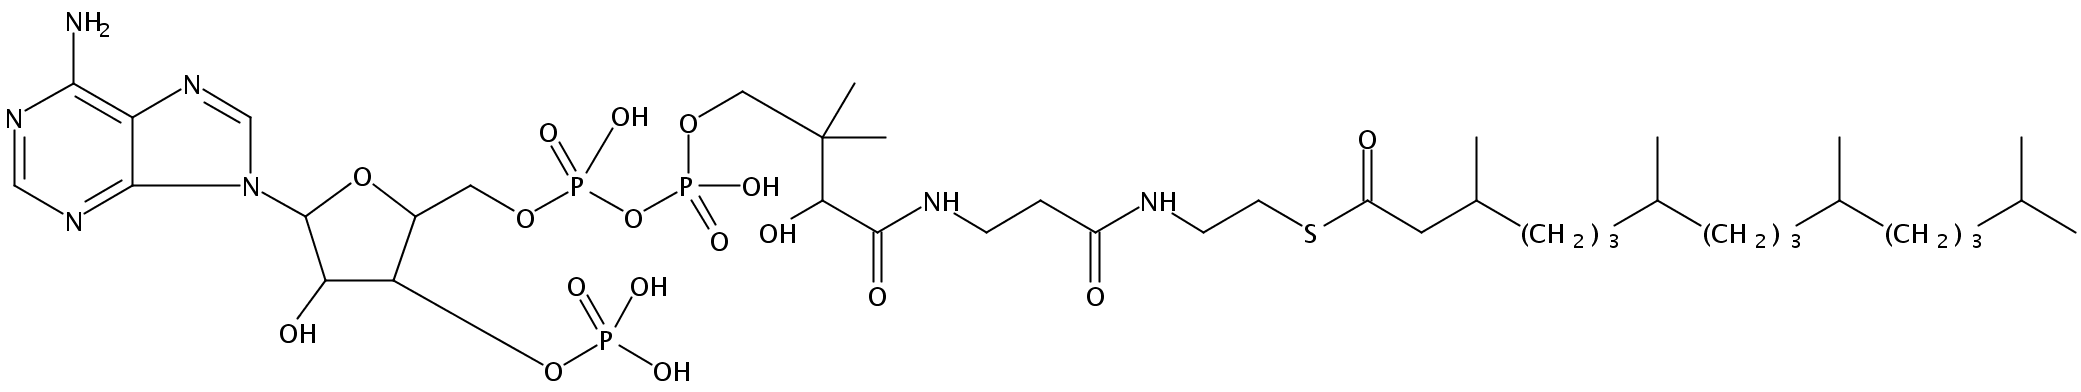 Structural formula of 3,7,11,15-Tetramethylhexadecanoyl Coenzyme A (NH4)3 salt